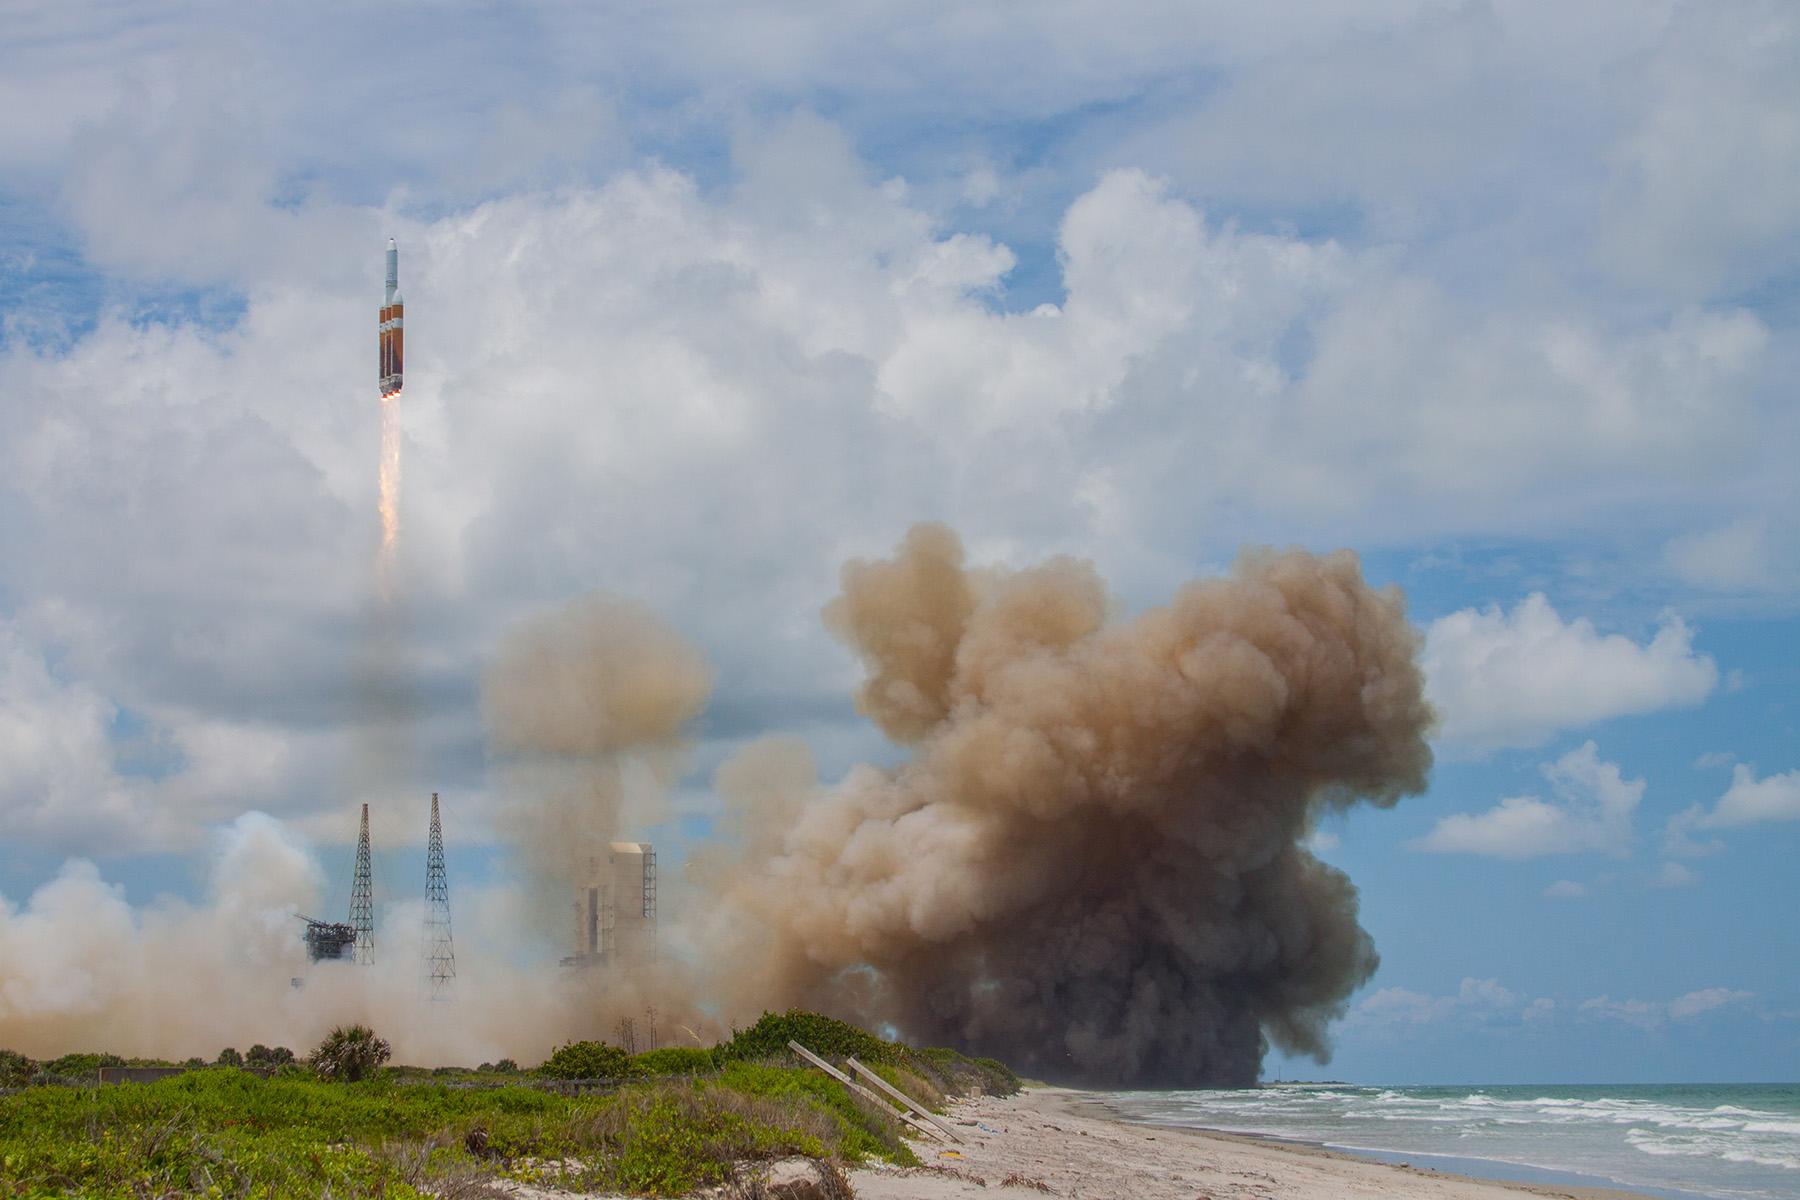 WATCH LIVE @ 8:17 am ET THURSDAY: Atlas V Rocket Launching Spy Satellite